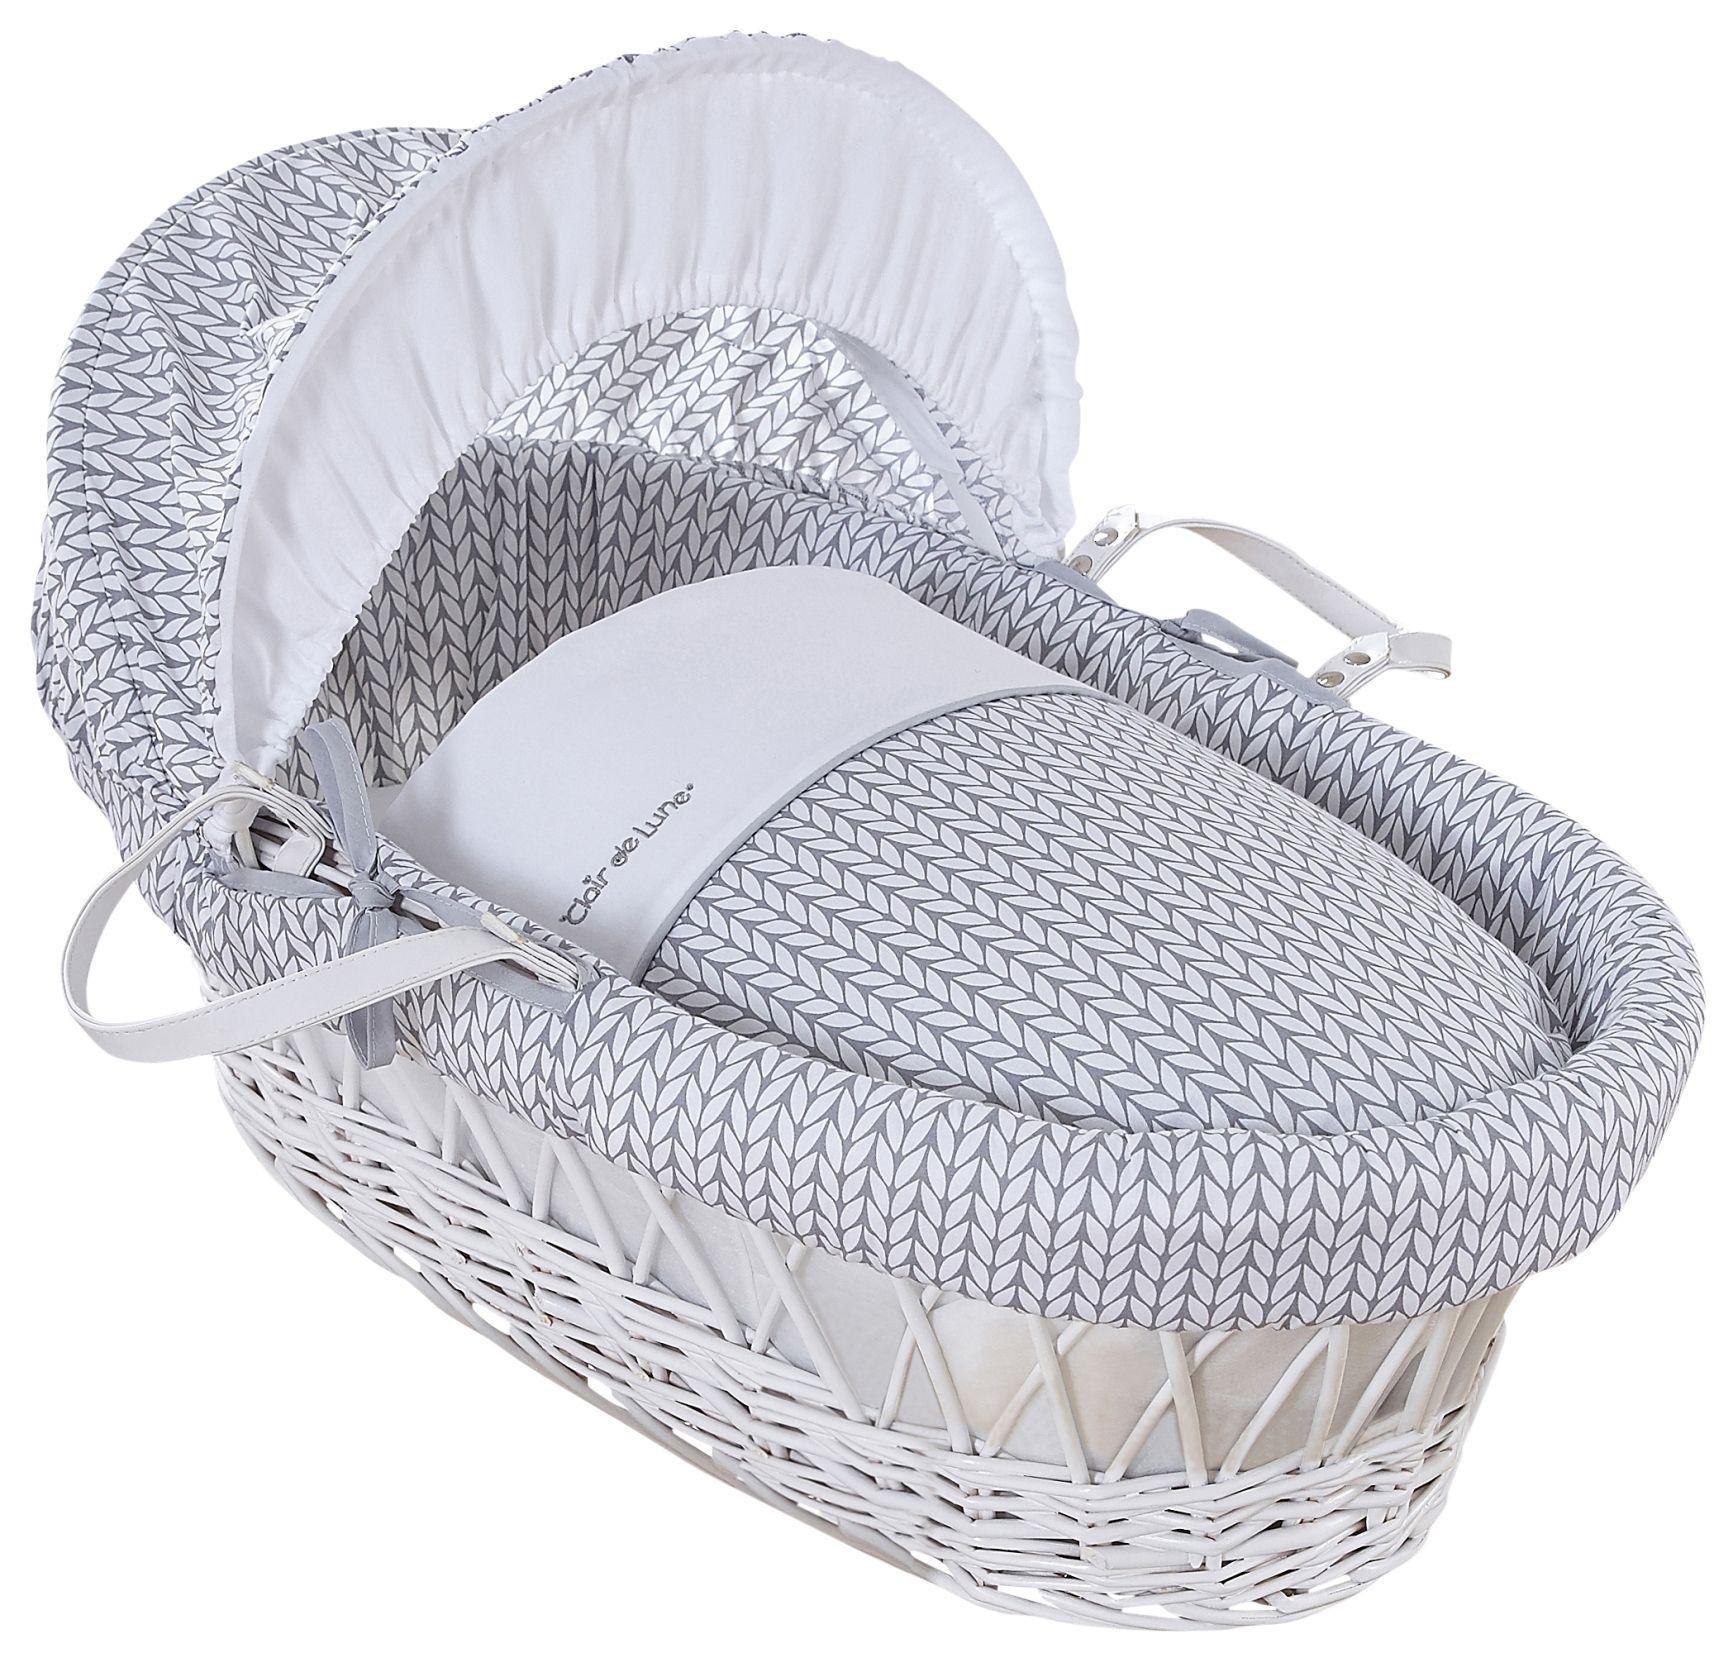 Image of Clair de Lune Barley B??b?? White Wicker Moses Basket - Grey.